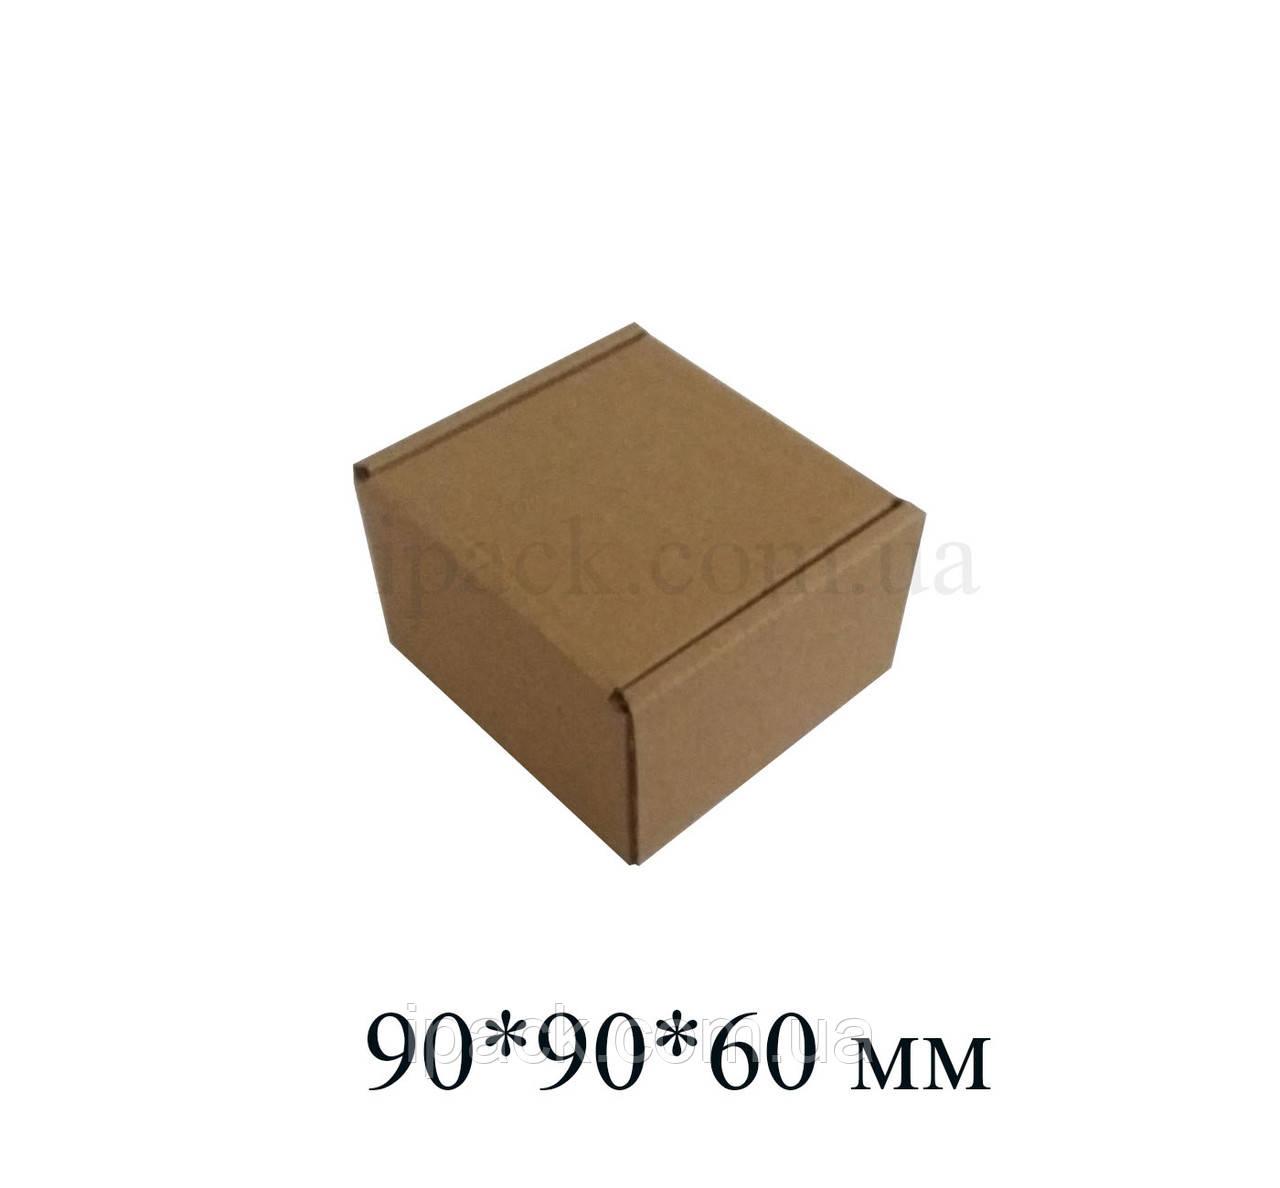 Коробка картонная самосборная, 90*90*60, мм, бурая, крафт, микрогофрокартон